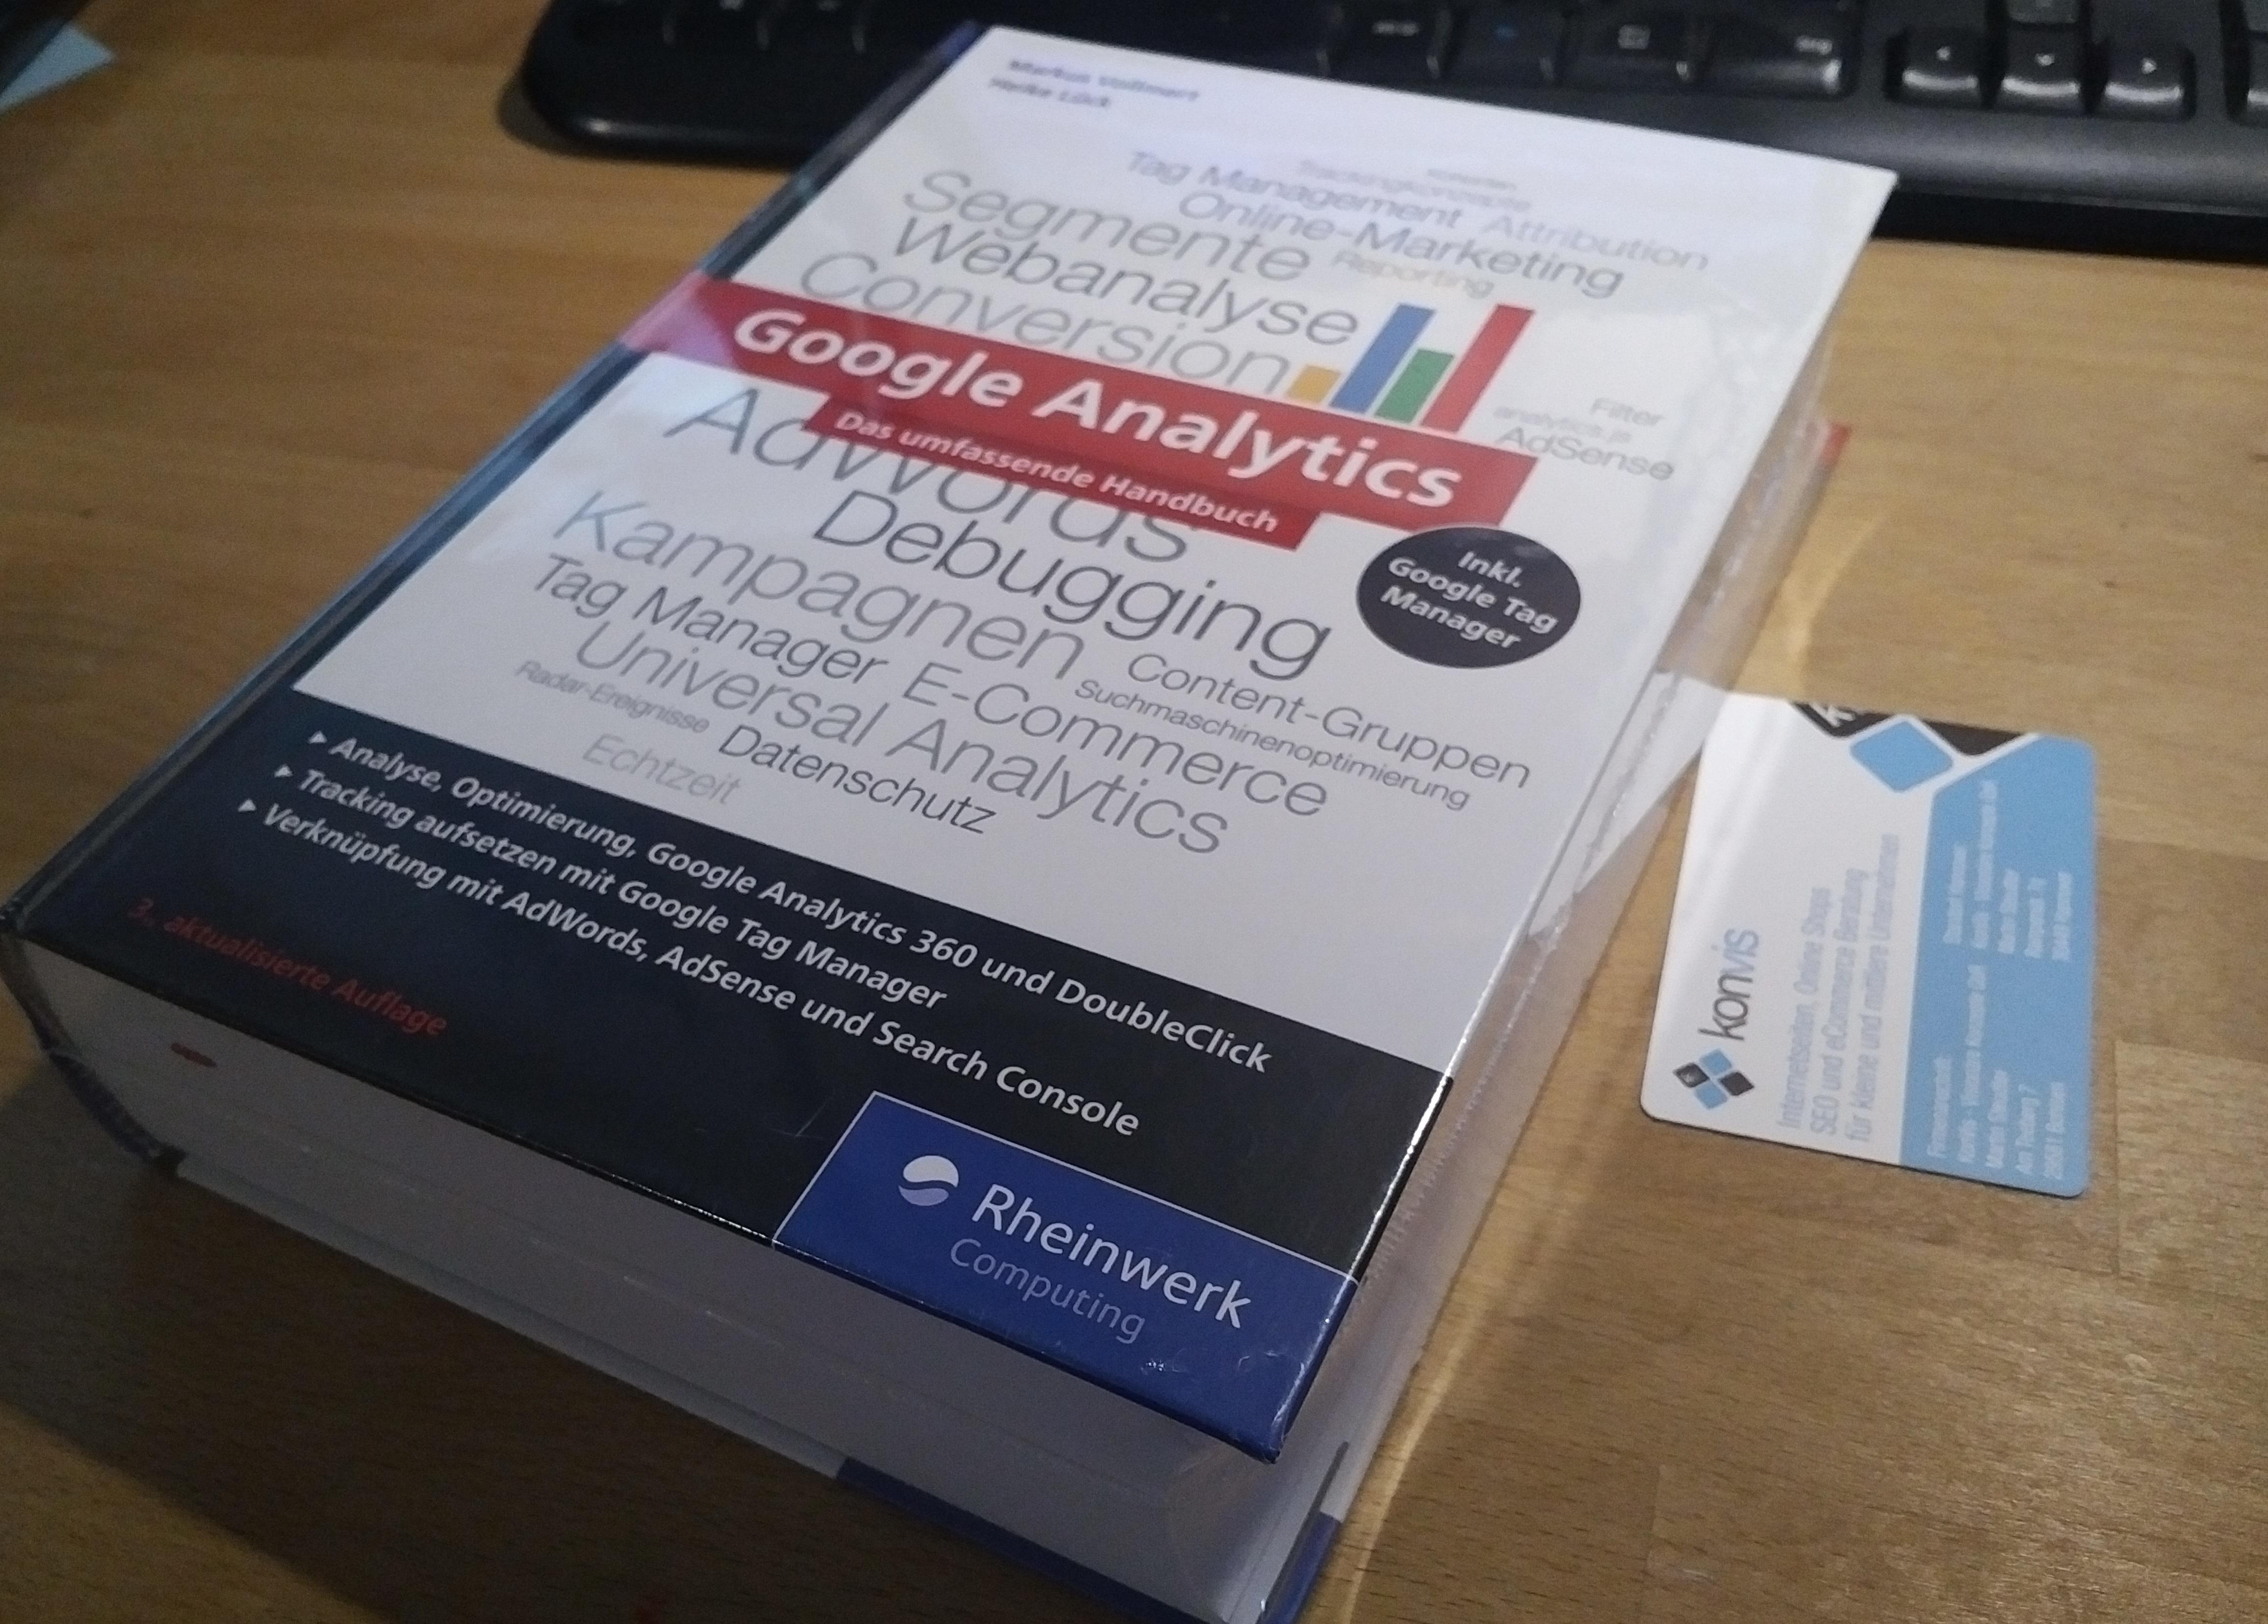 google-analytics-markus-vollmert-heike-lueke-rheinwerk-computing